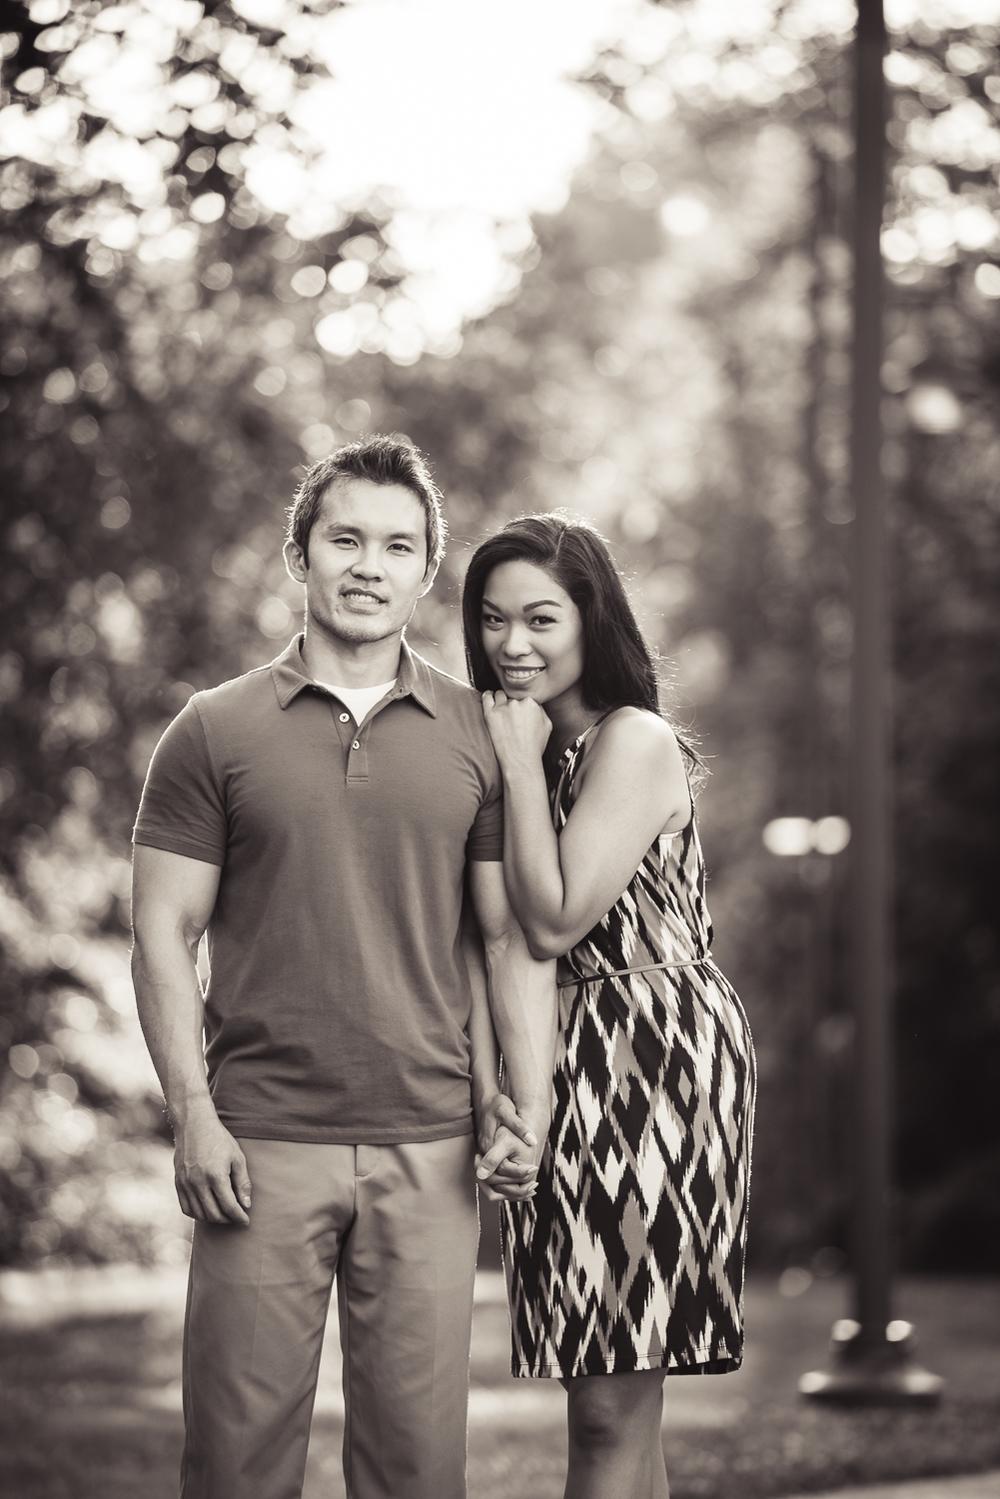 20160705 - Justine Wu Engagement Pix LR-24.jpg